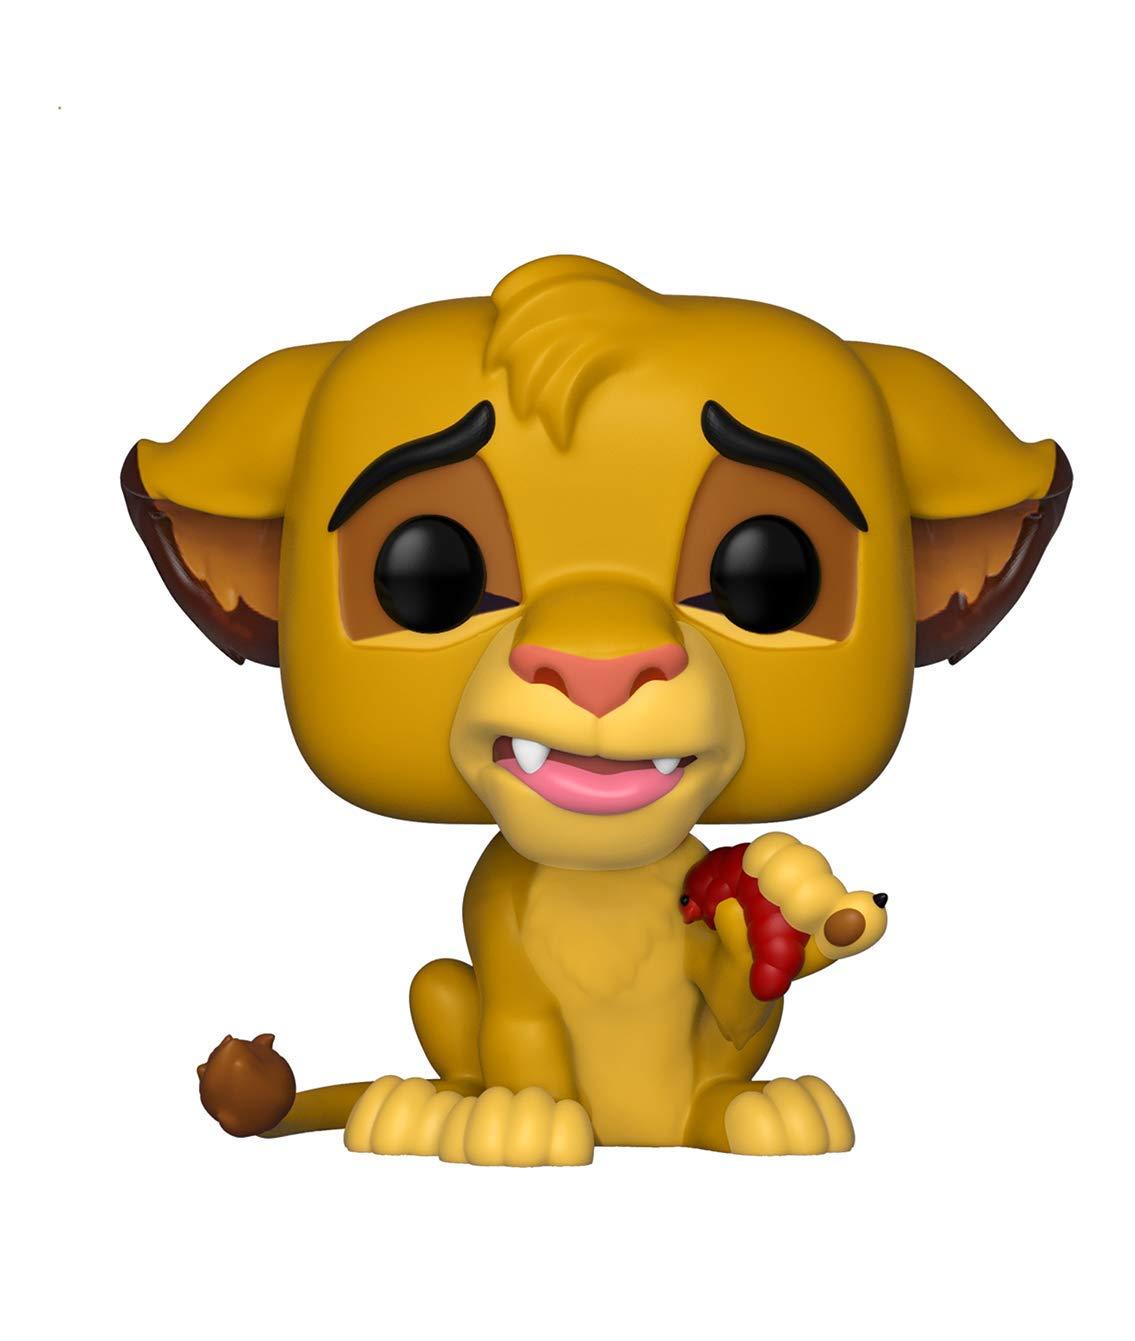 FunKo 36395 POP! Vinyl: König der Löwen: Simba, Mehrfarbig